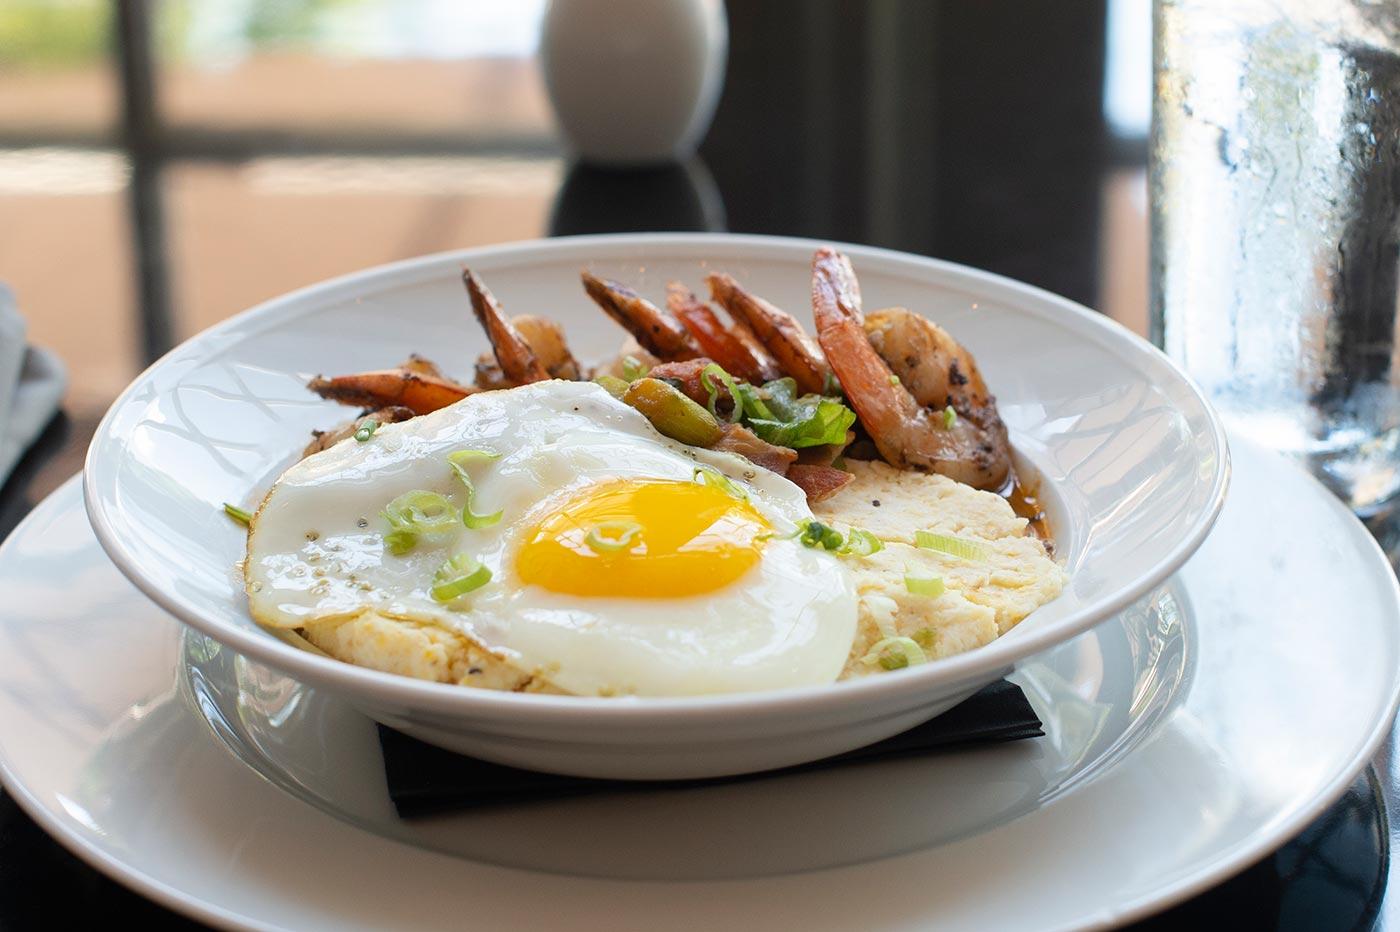 sunnyside up eye on scrambled eggs and side of shrimp